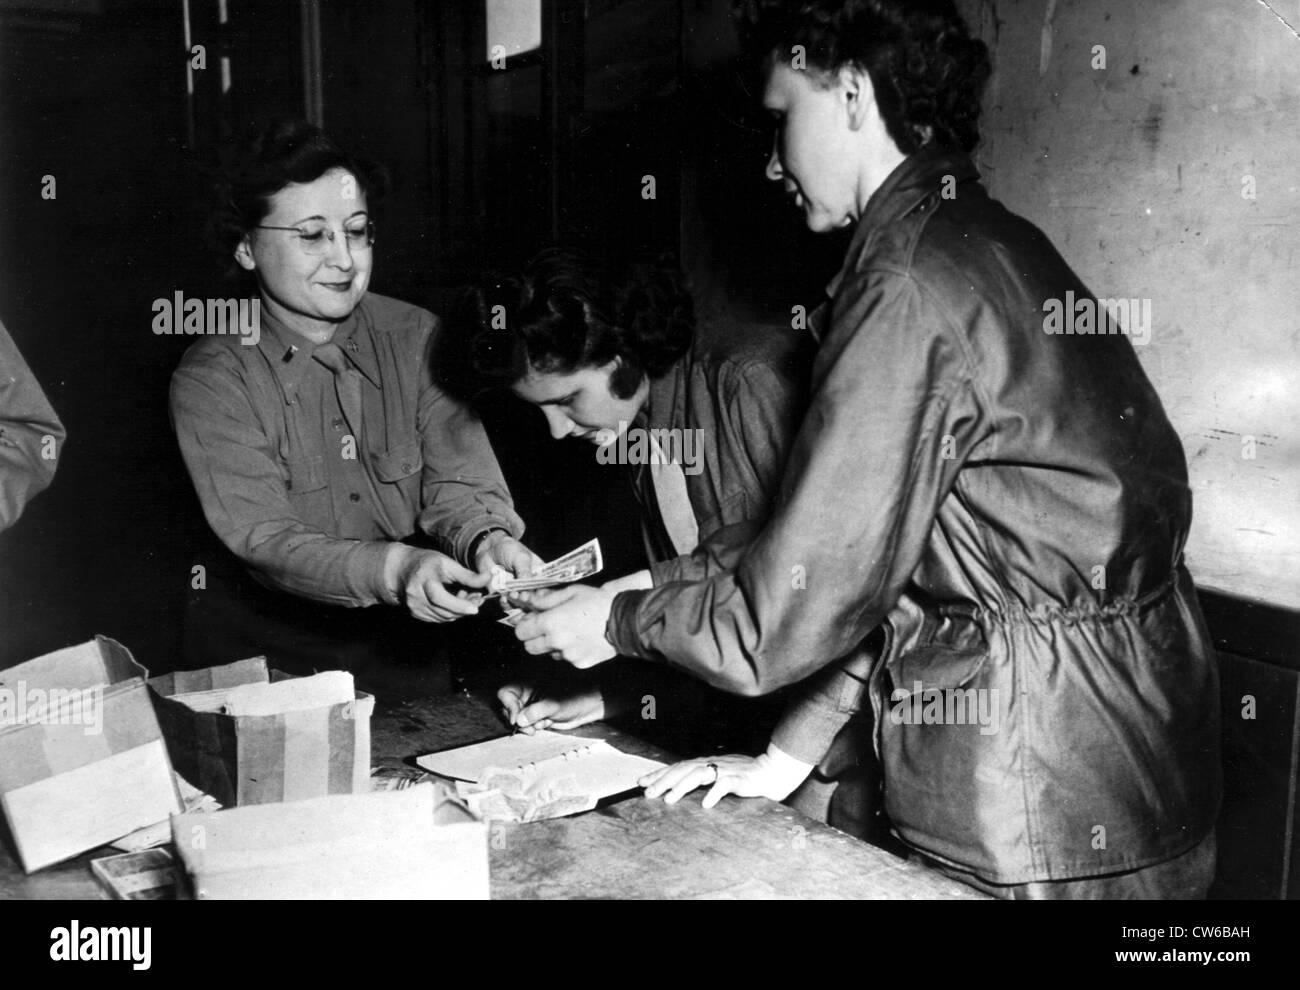 Stati Uniti WAC officer questioni di denaro francese (Inghilterra), 1944 Immagini Stock